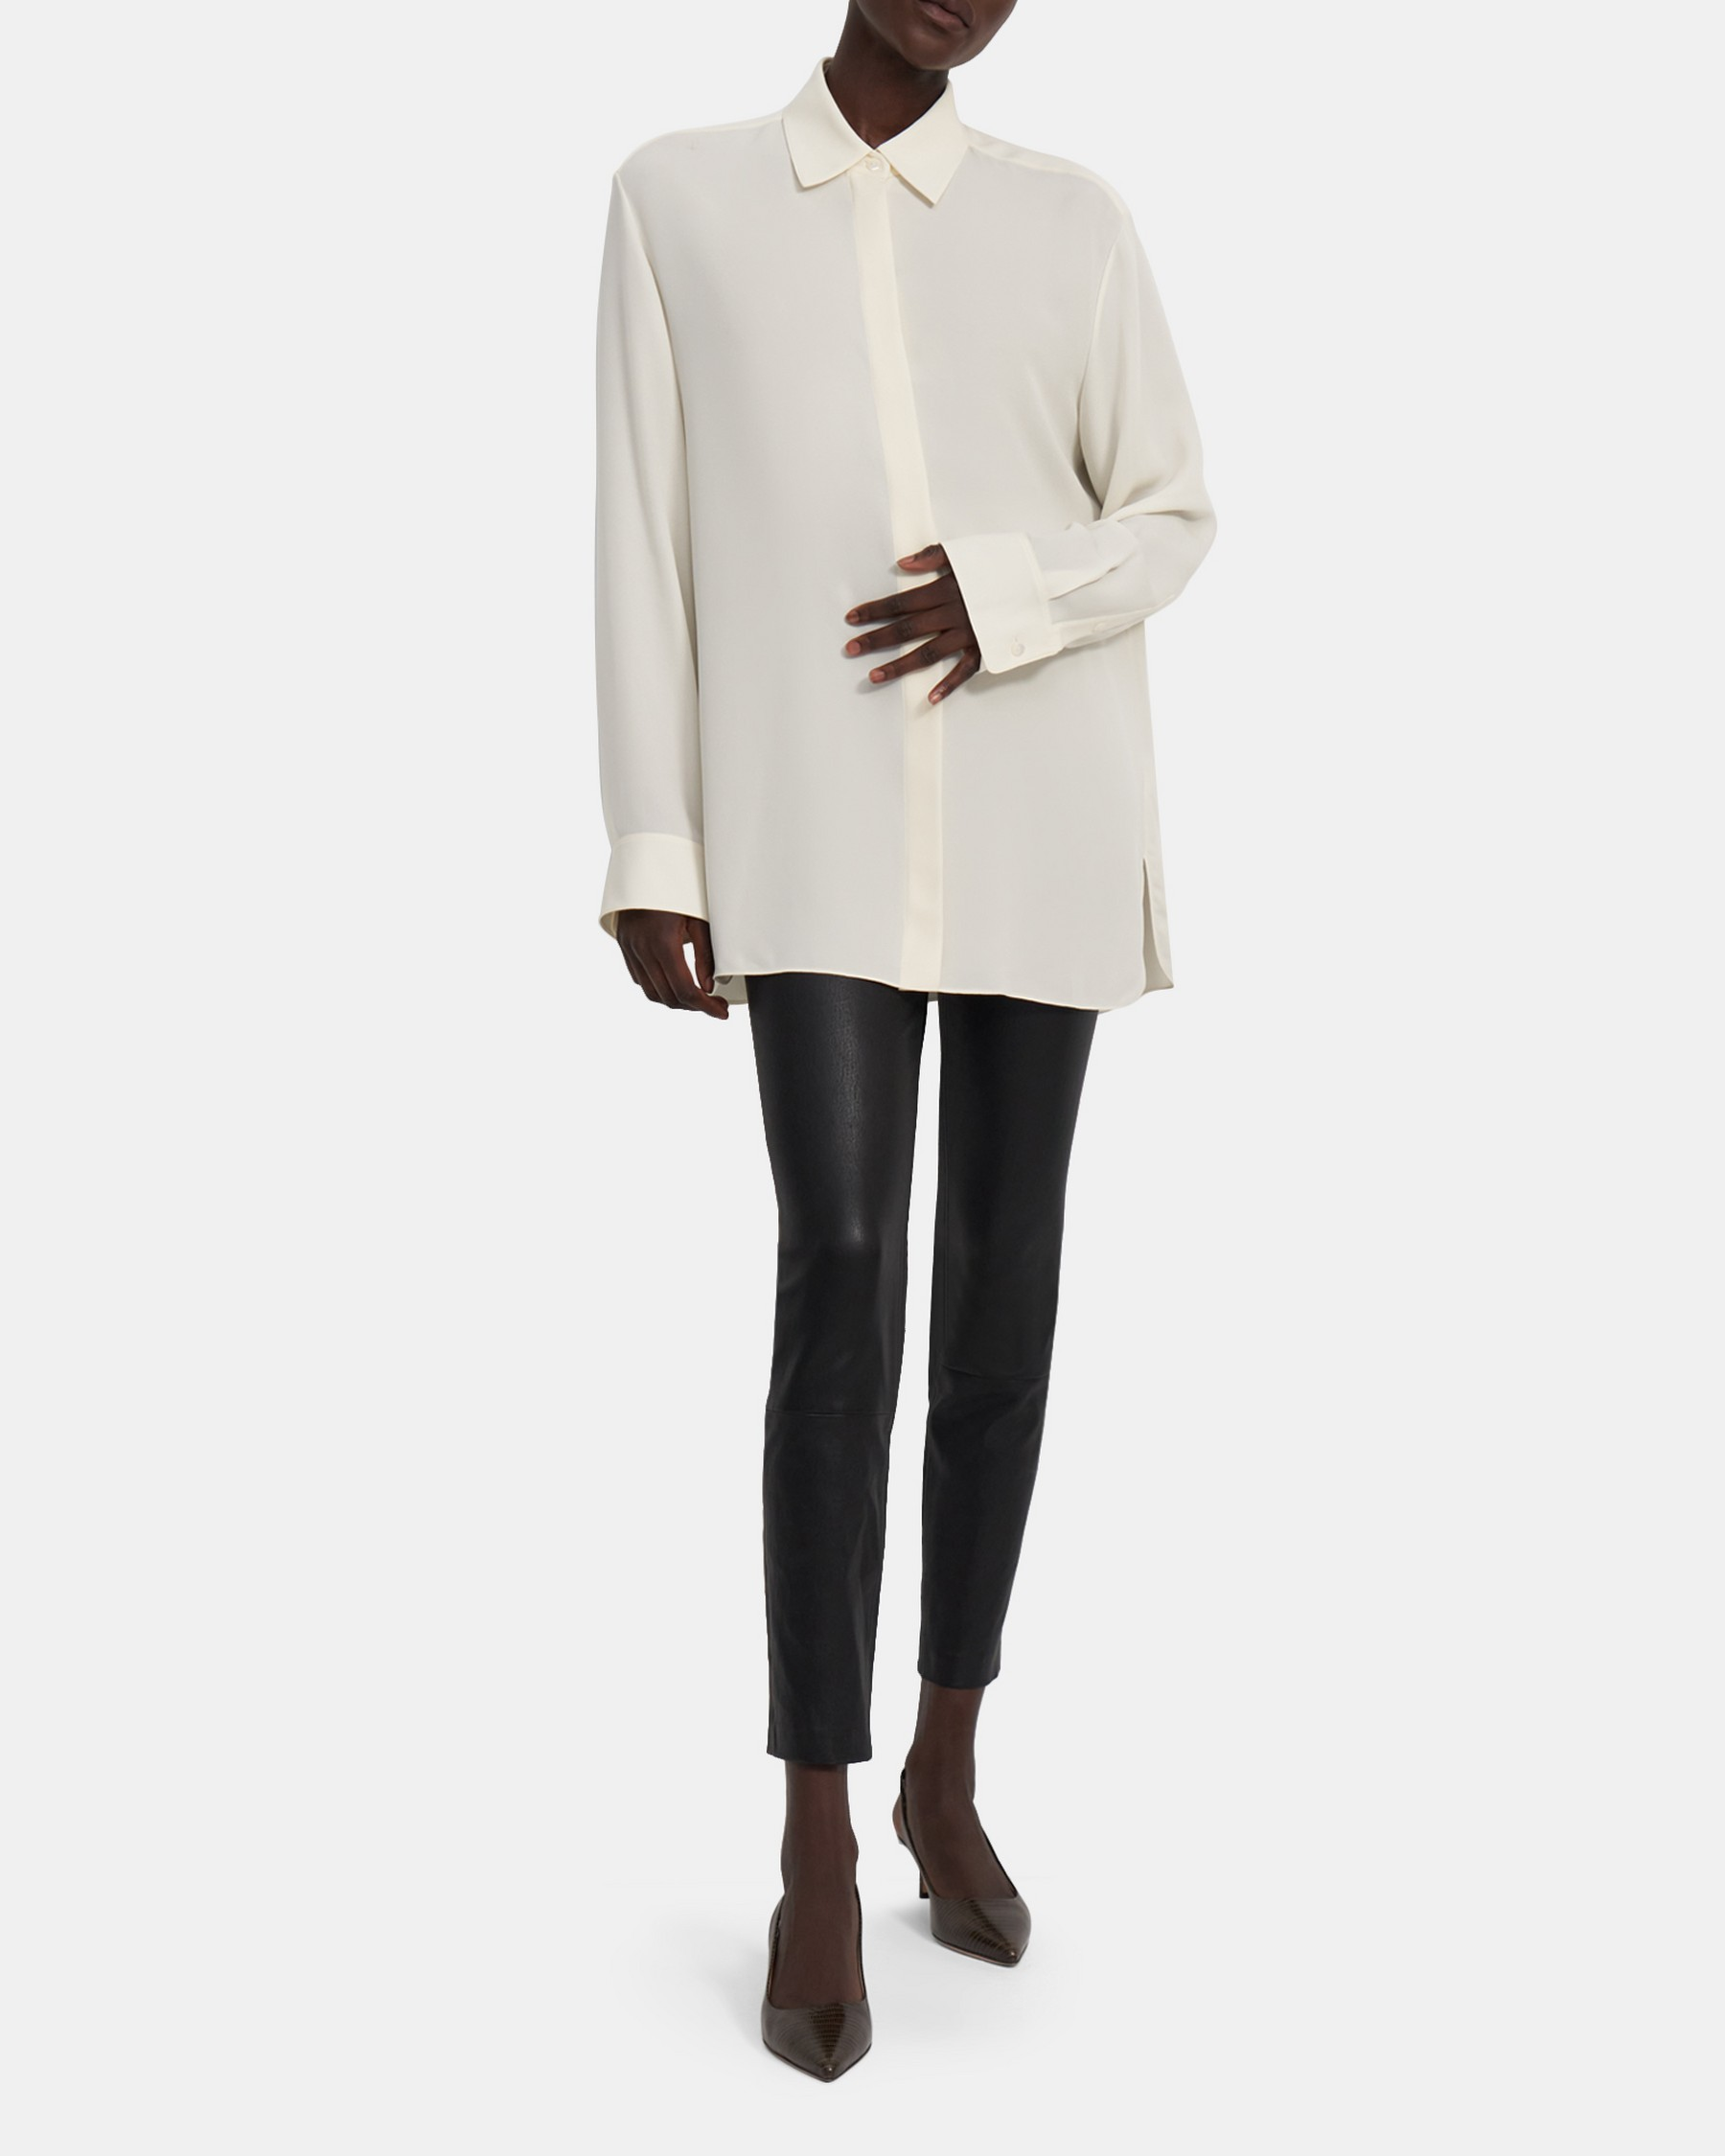 Menswear Shirt in Silk Georgette   Theory